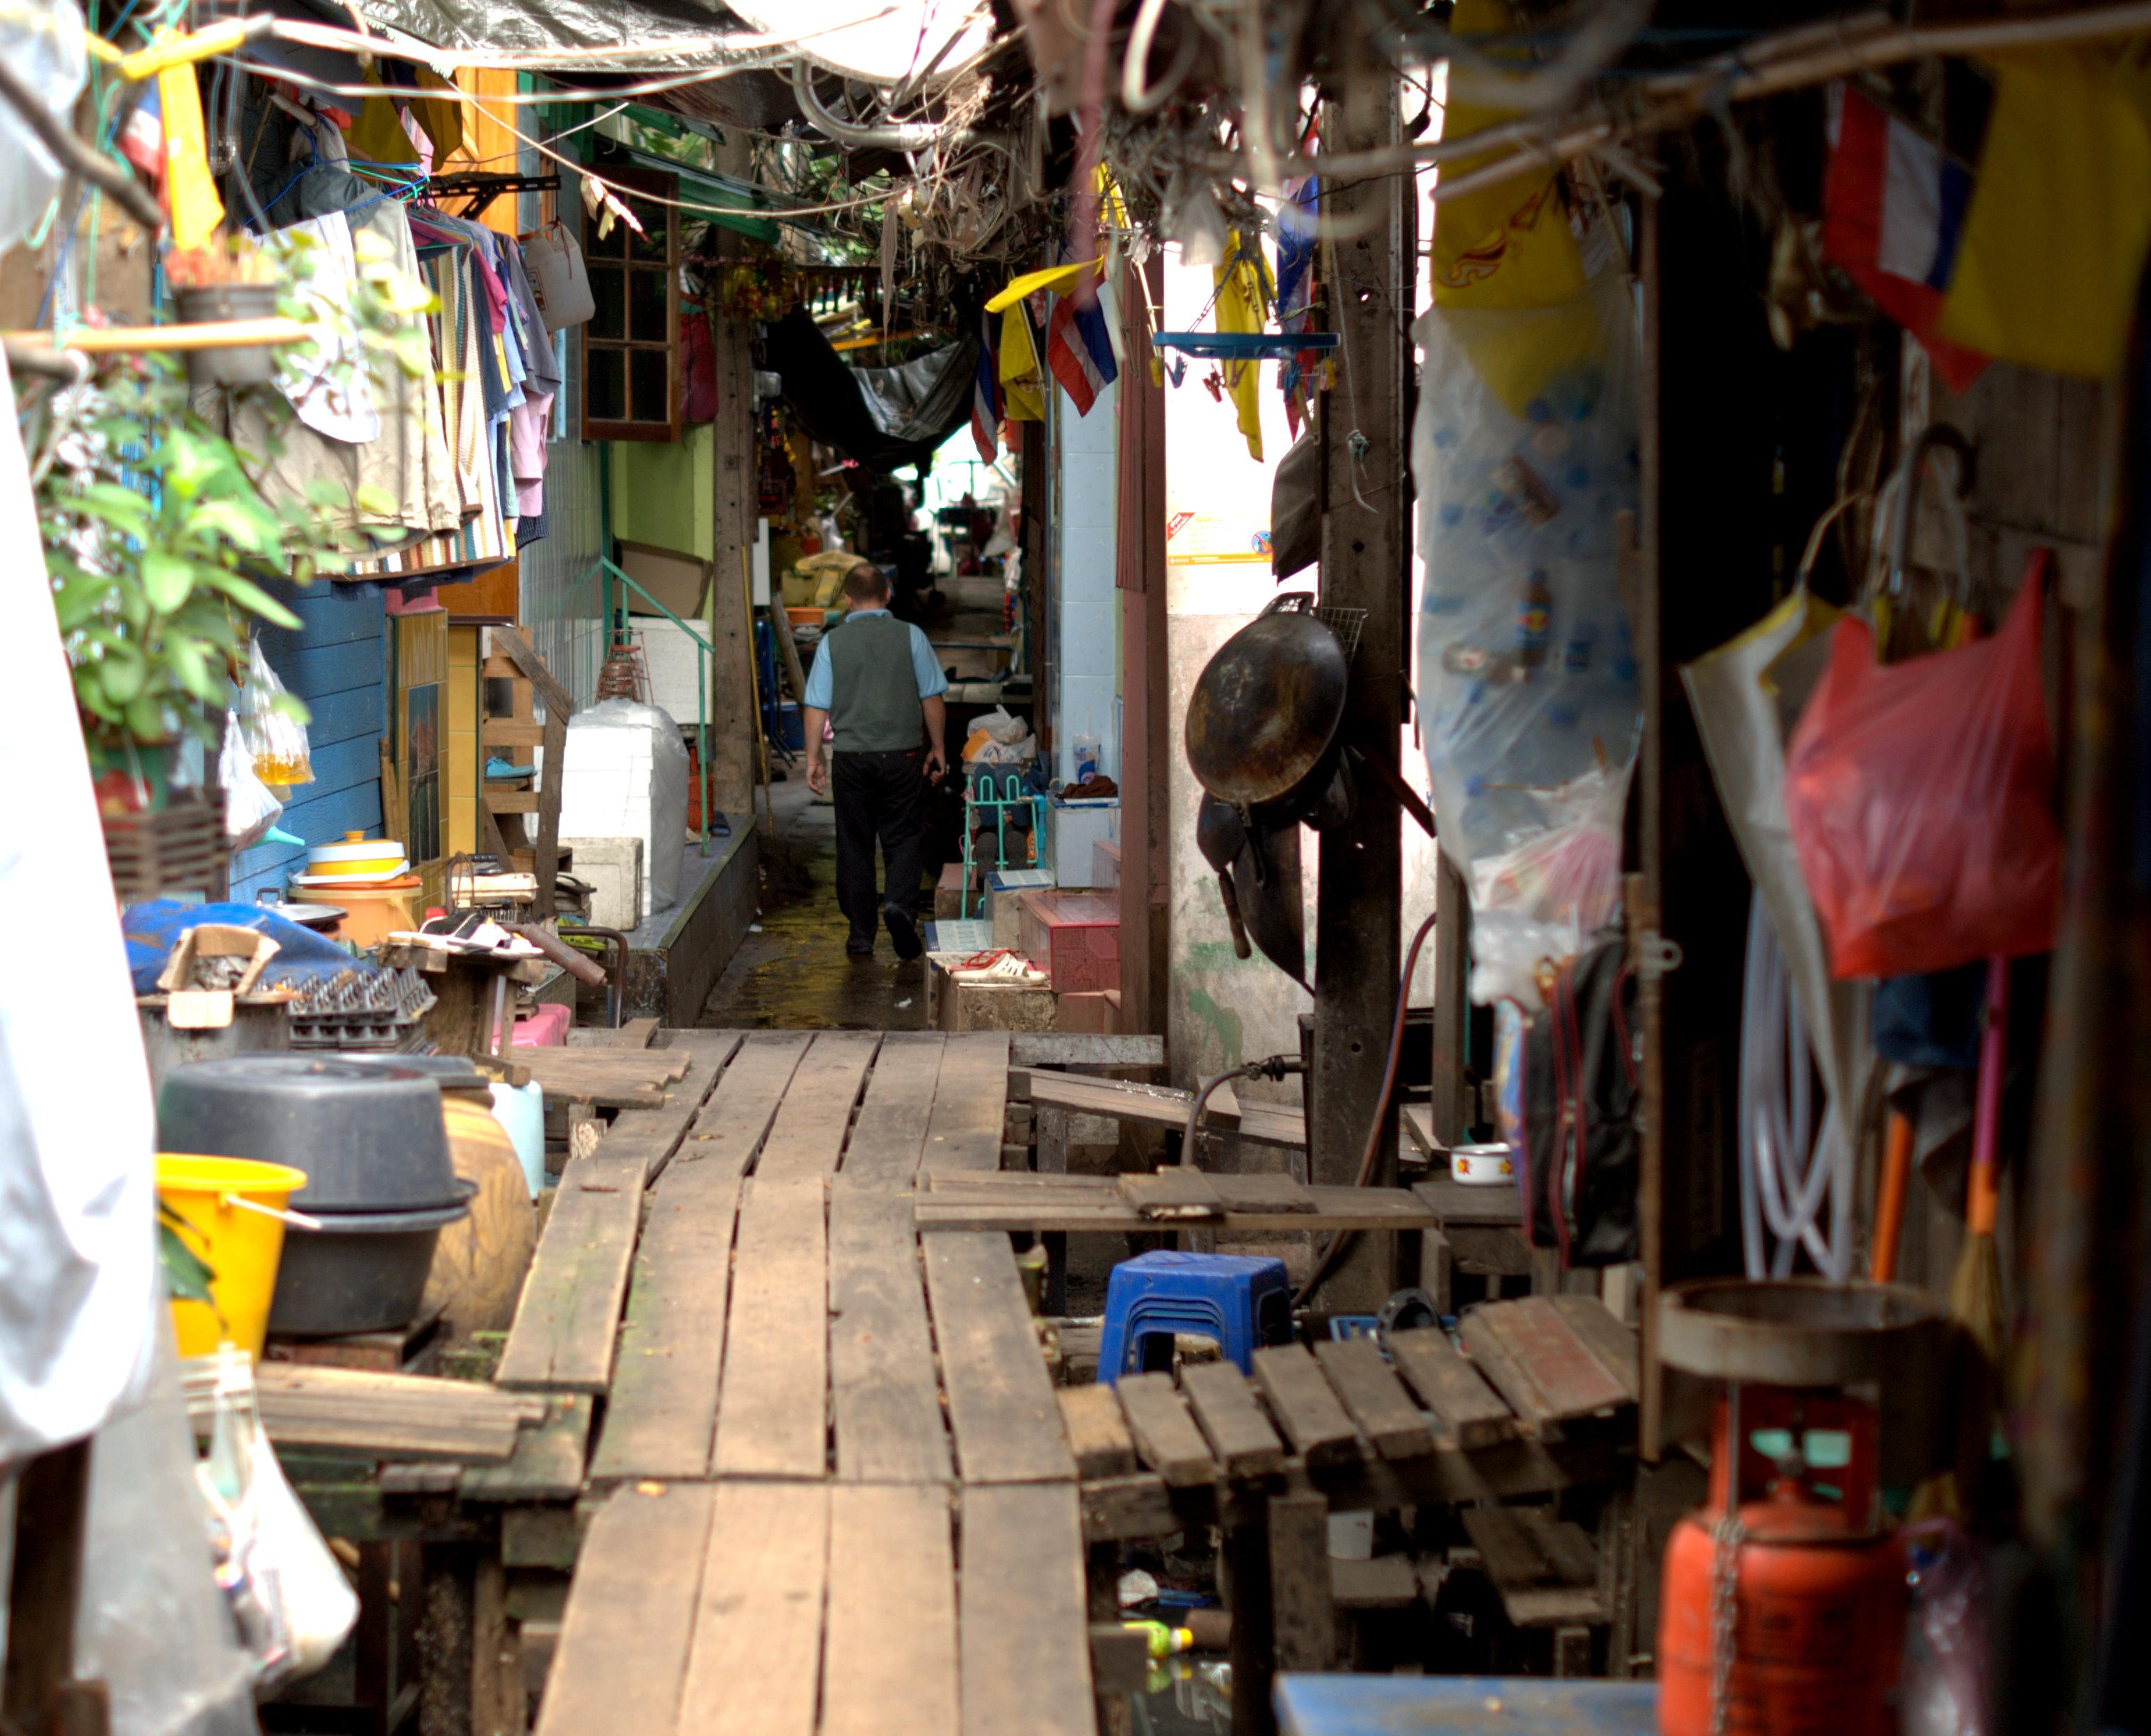 Bangkok (ostatni spacer autobusem i rzeką) 24